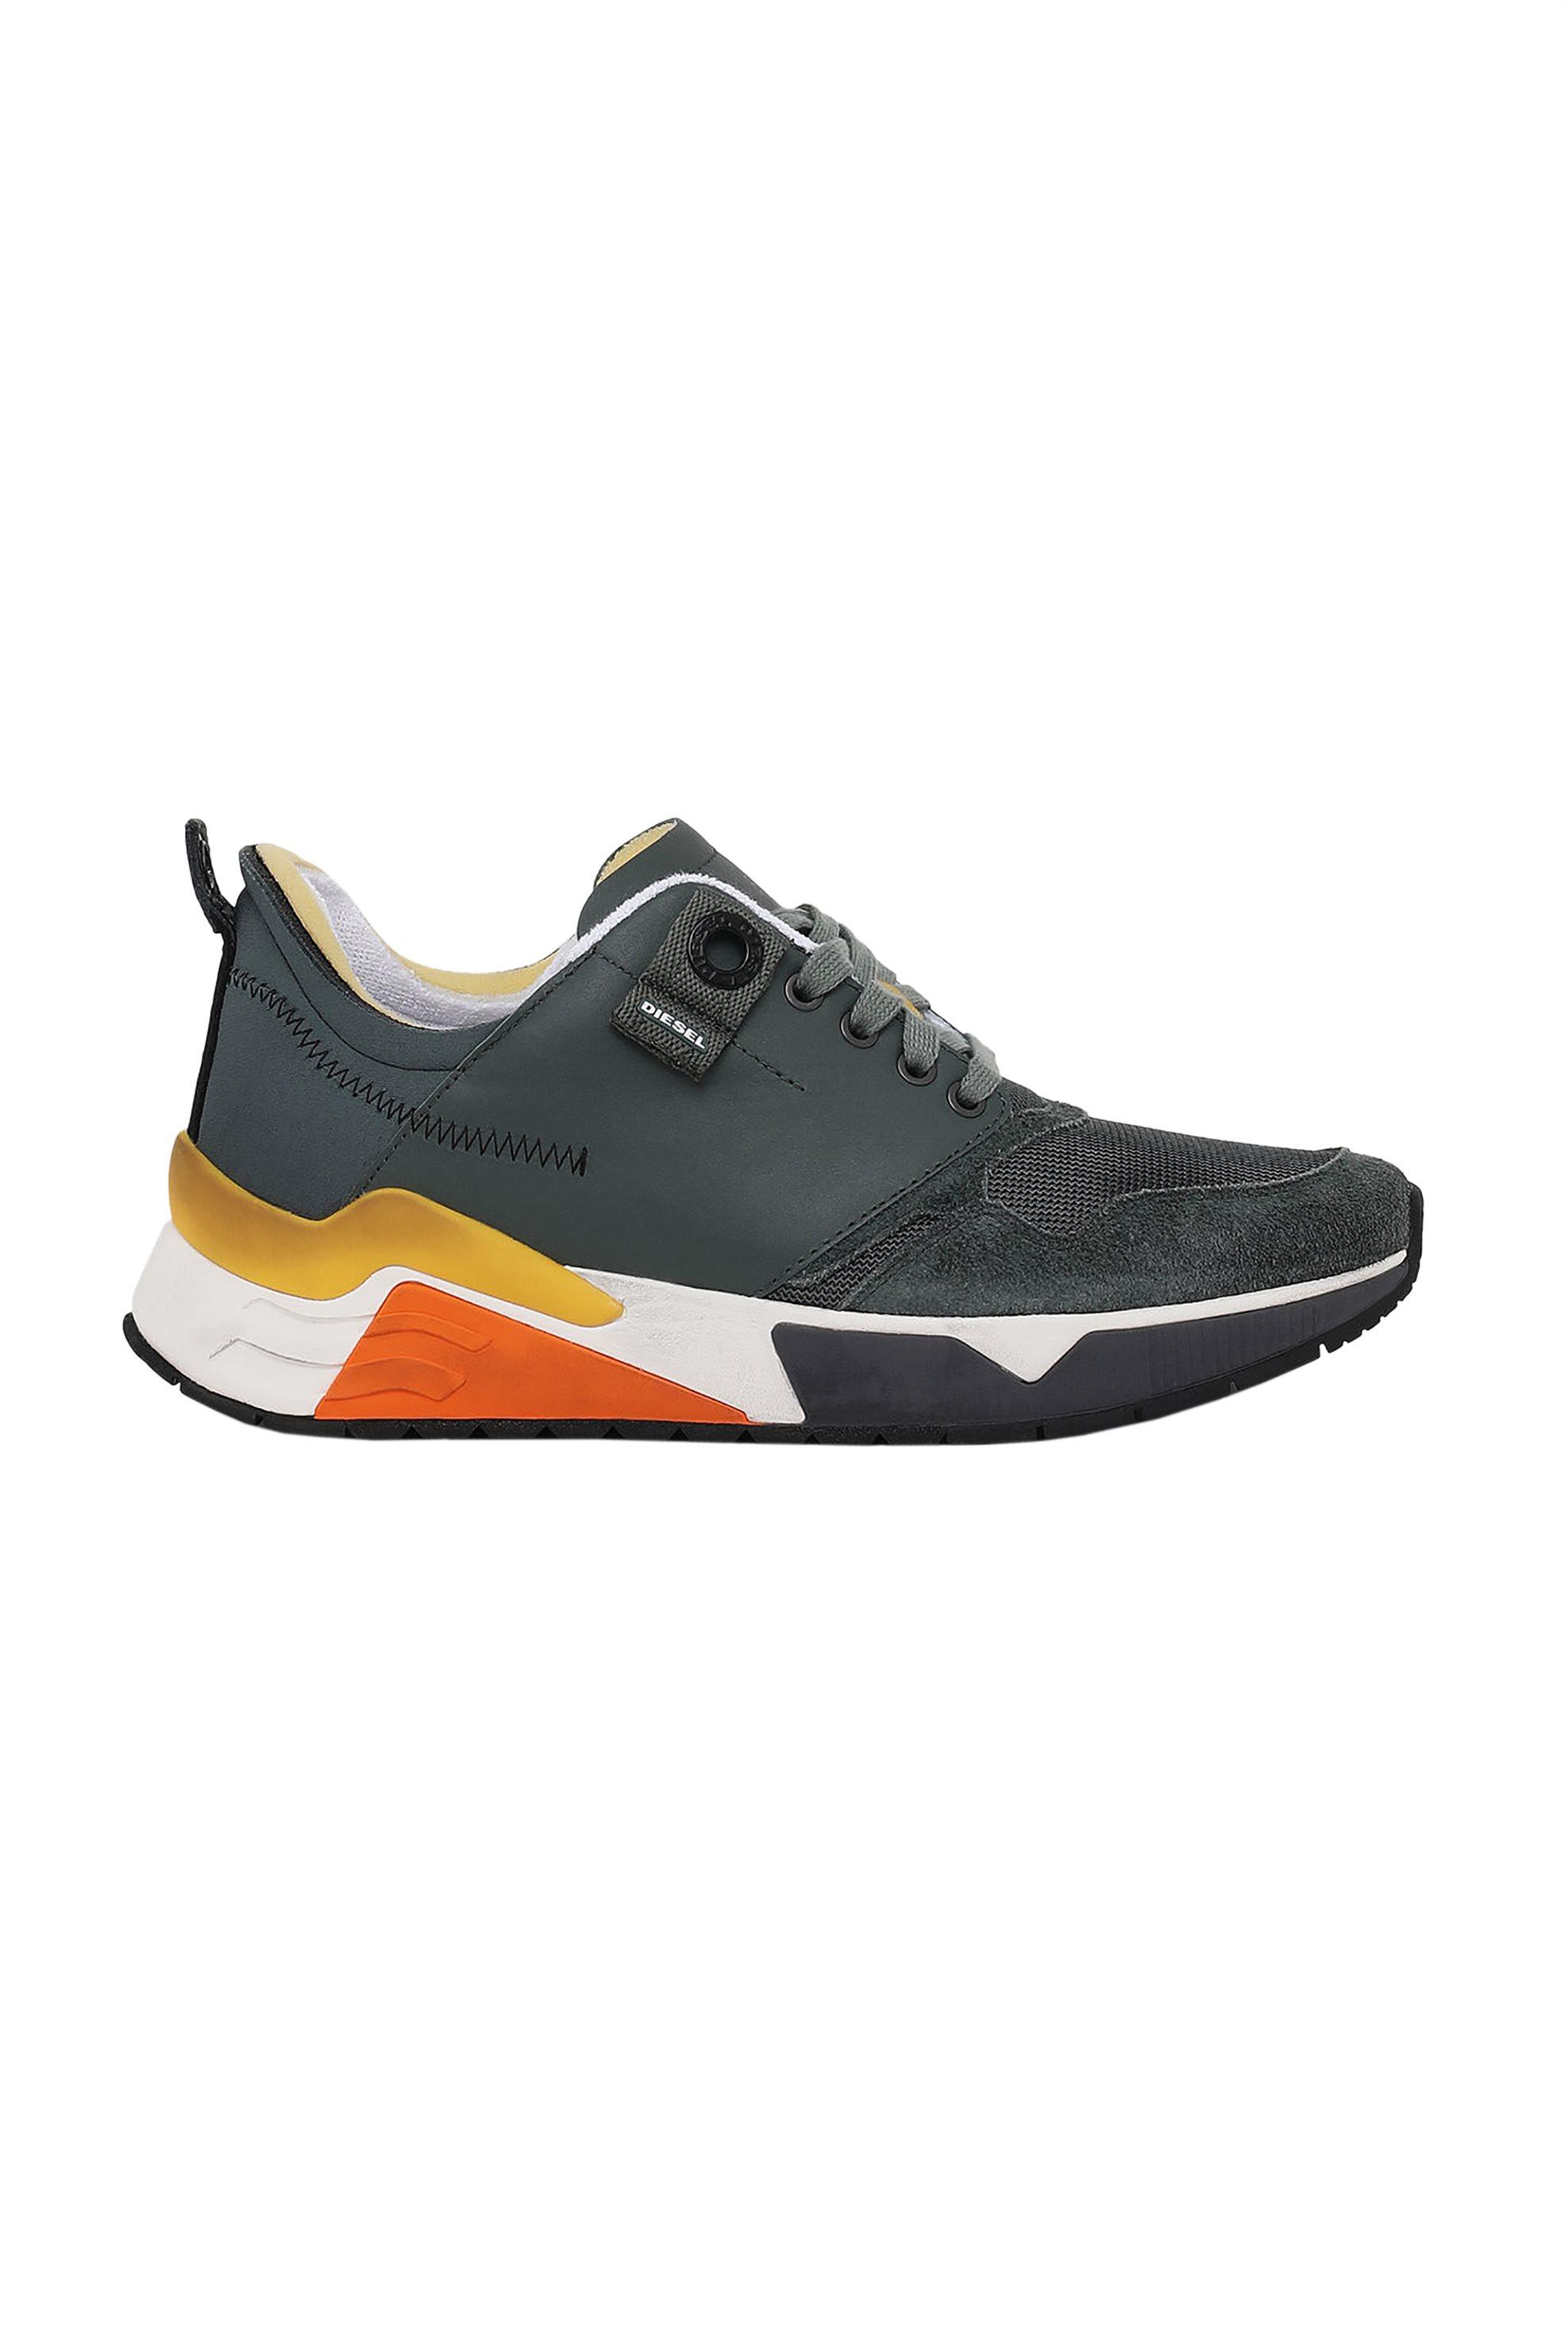 96f623840c5 Notos Diesel ανδρικά sneakers με χοντρή σόλα S Brentha – Y01911 PR173 –  Ανθρακί